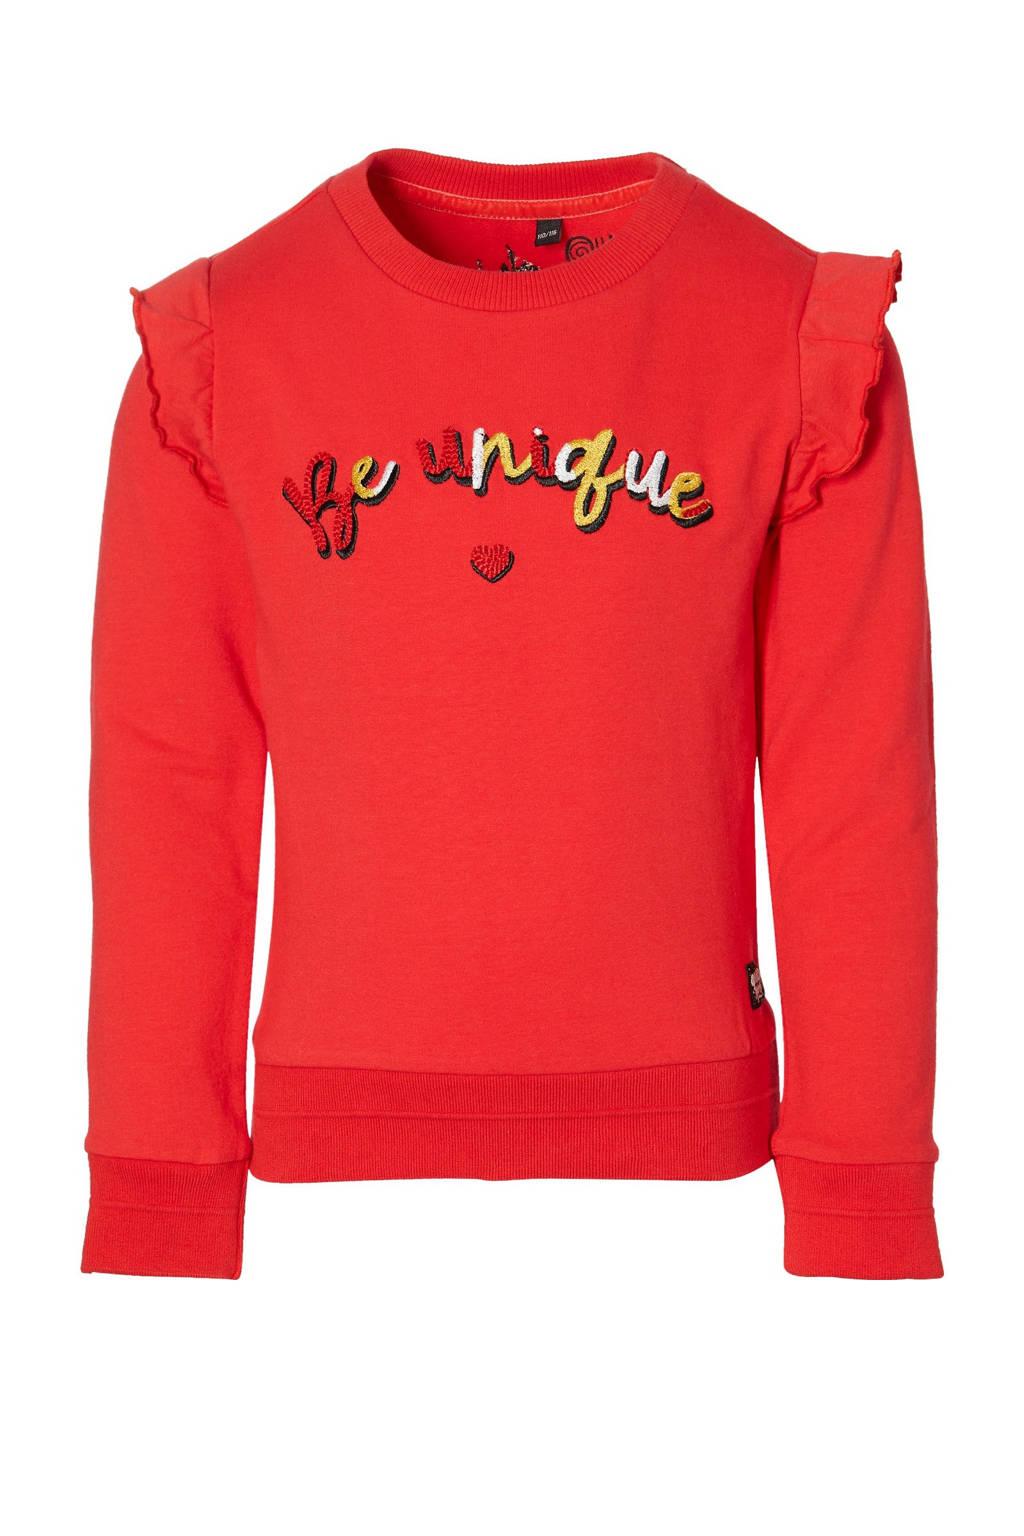 Quapi Girls regular fit sweater Djoah met tekst en ruches rood, Rood